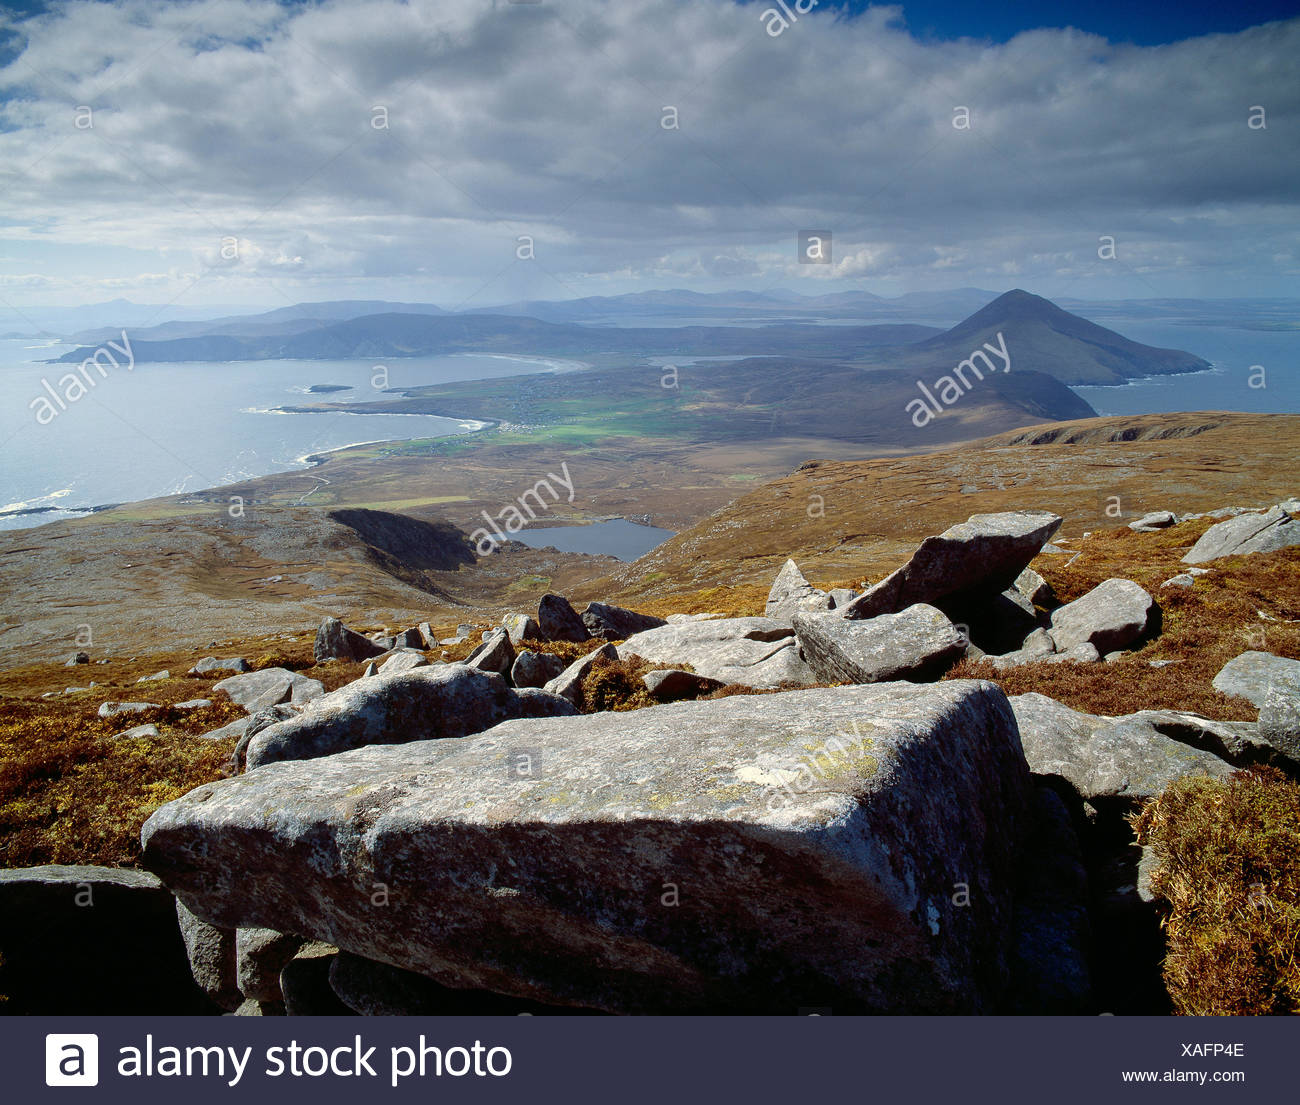 Ireland. County Mayo. Achill Island coast. - Stock Image